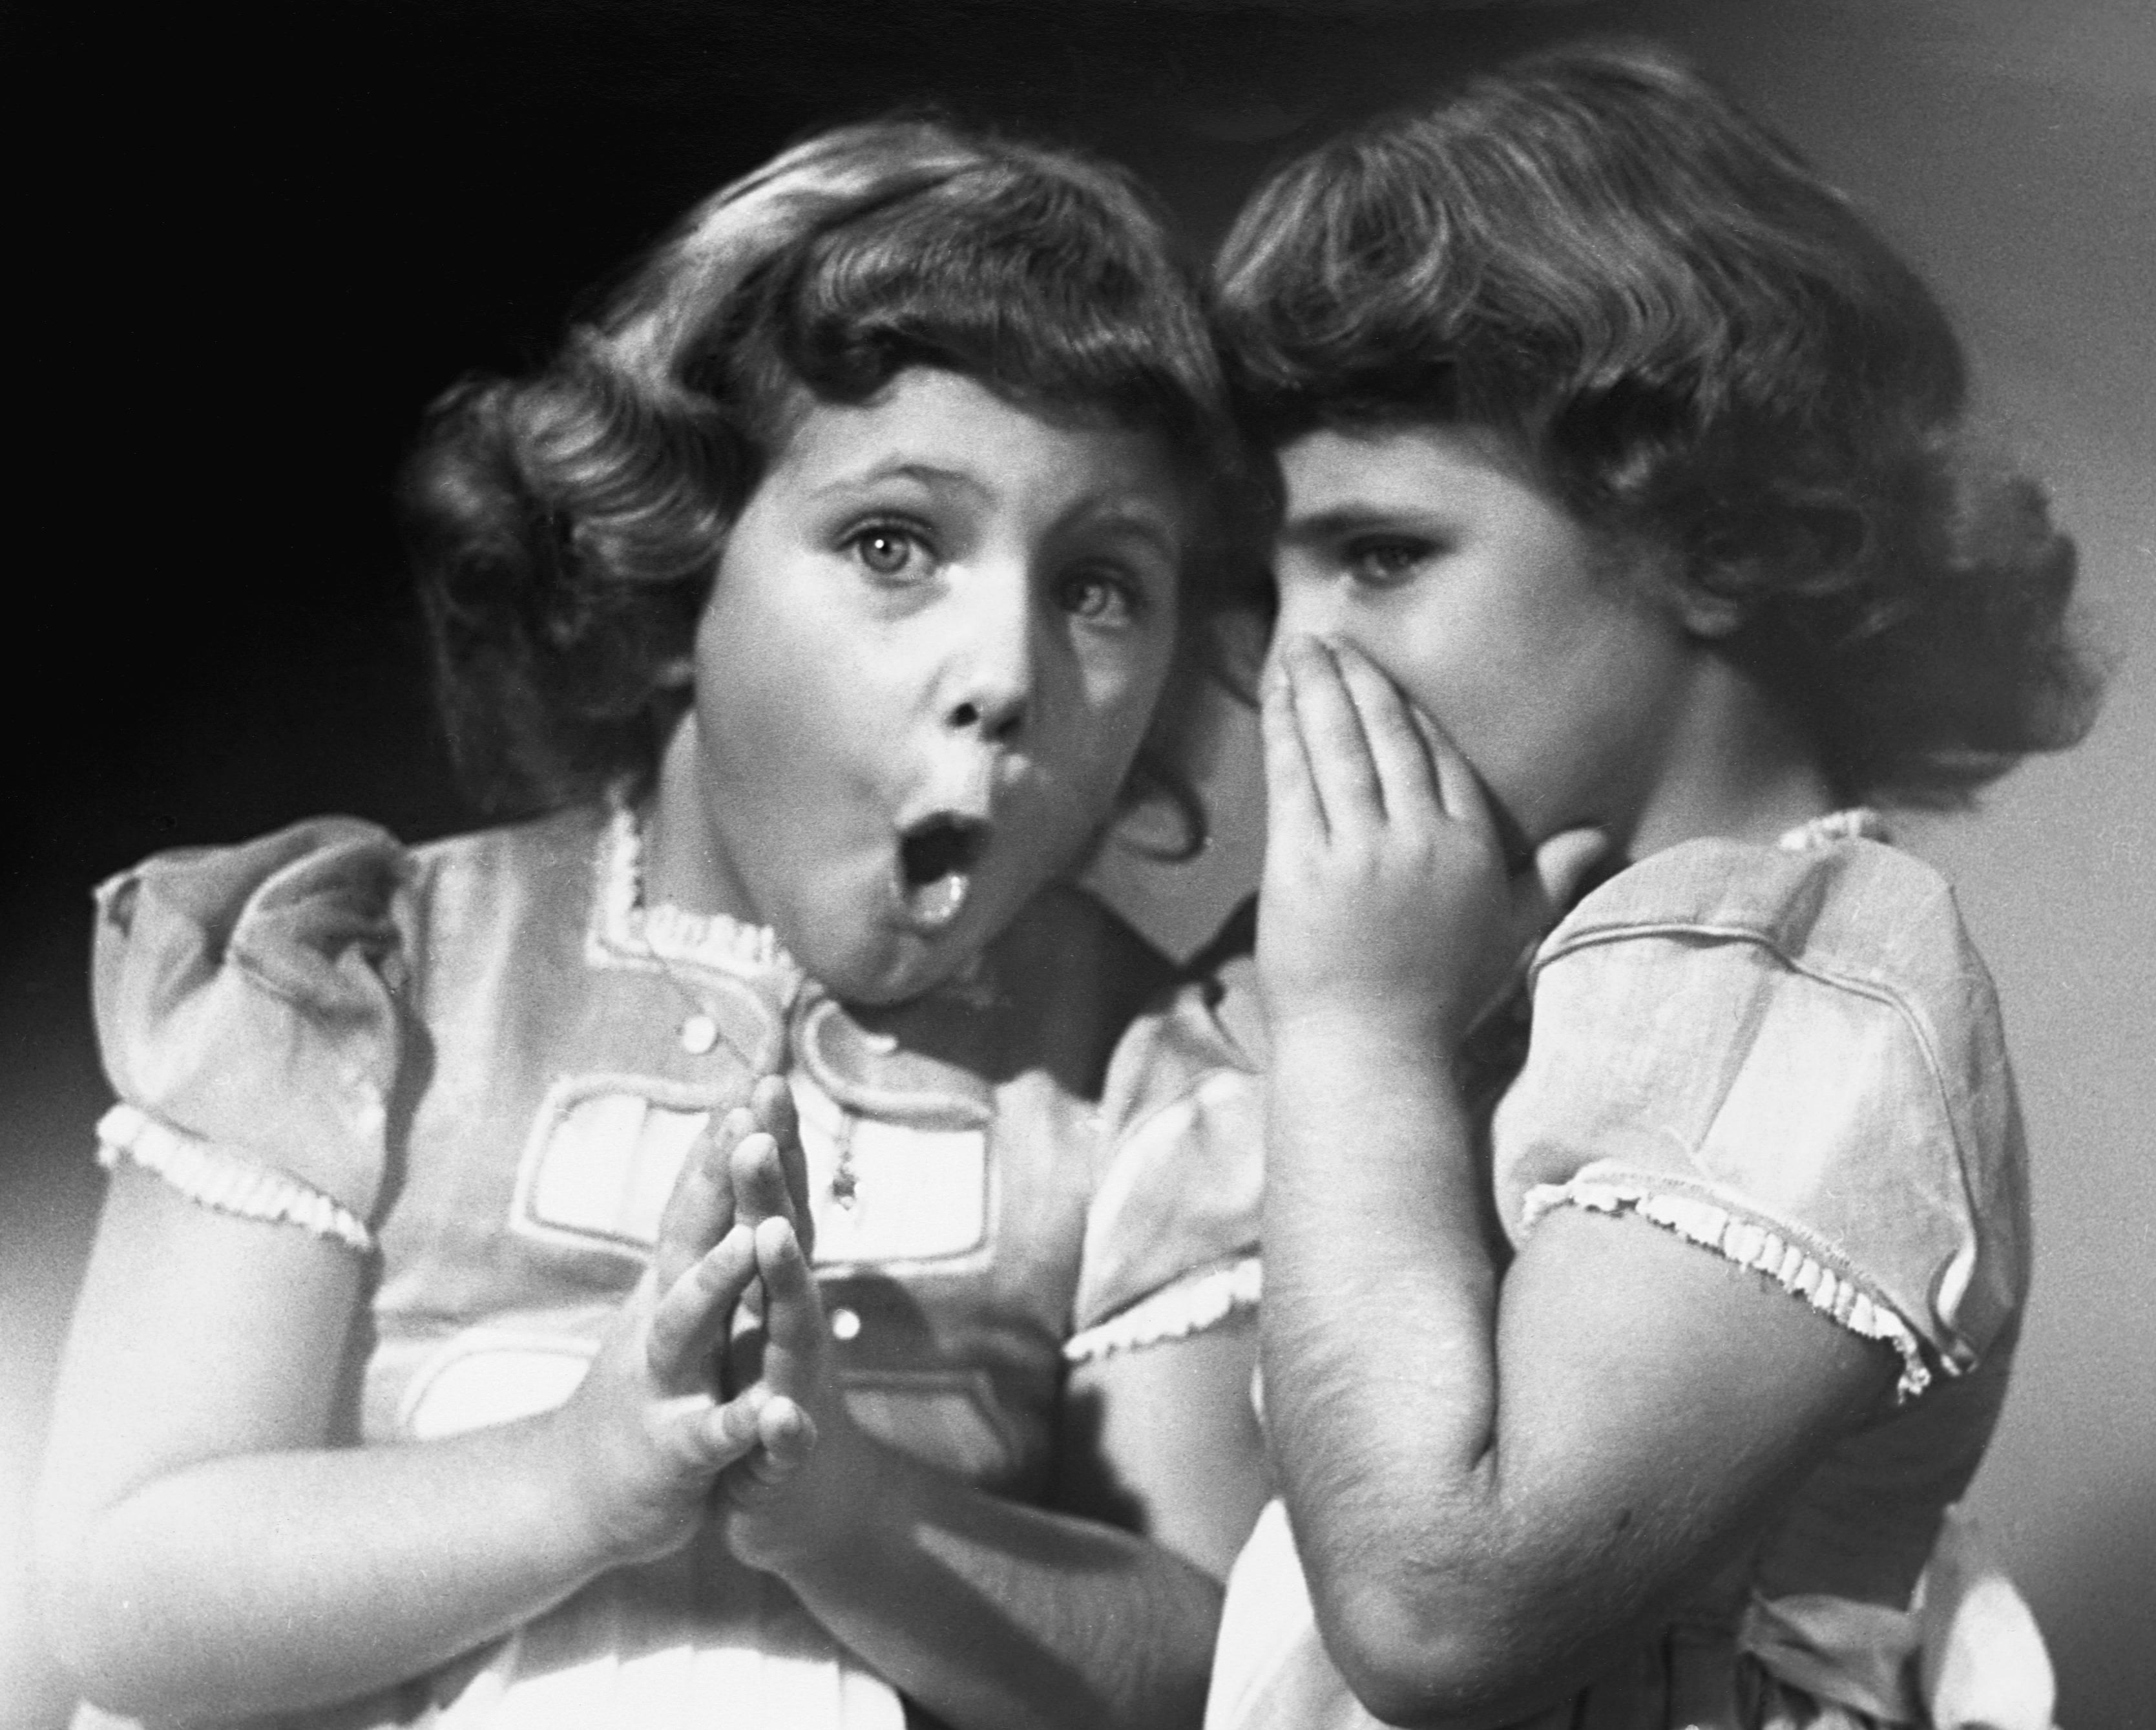 Twin sisters sharing secrets